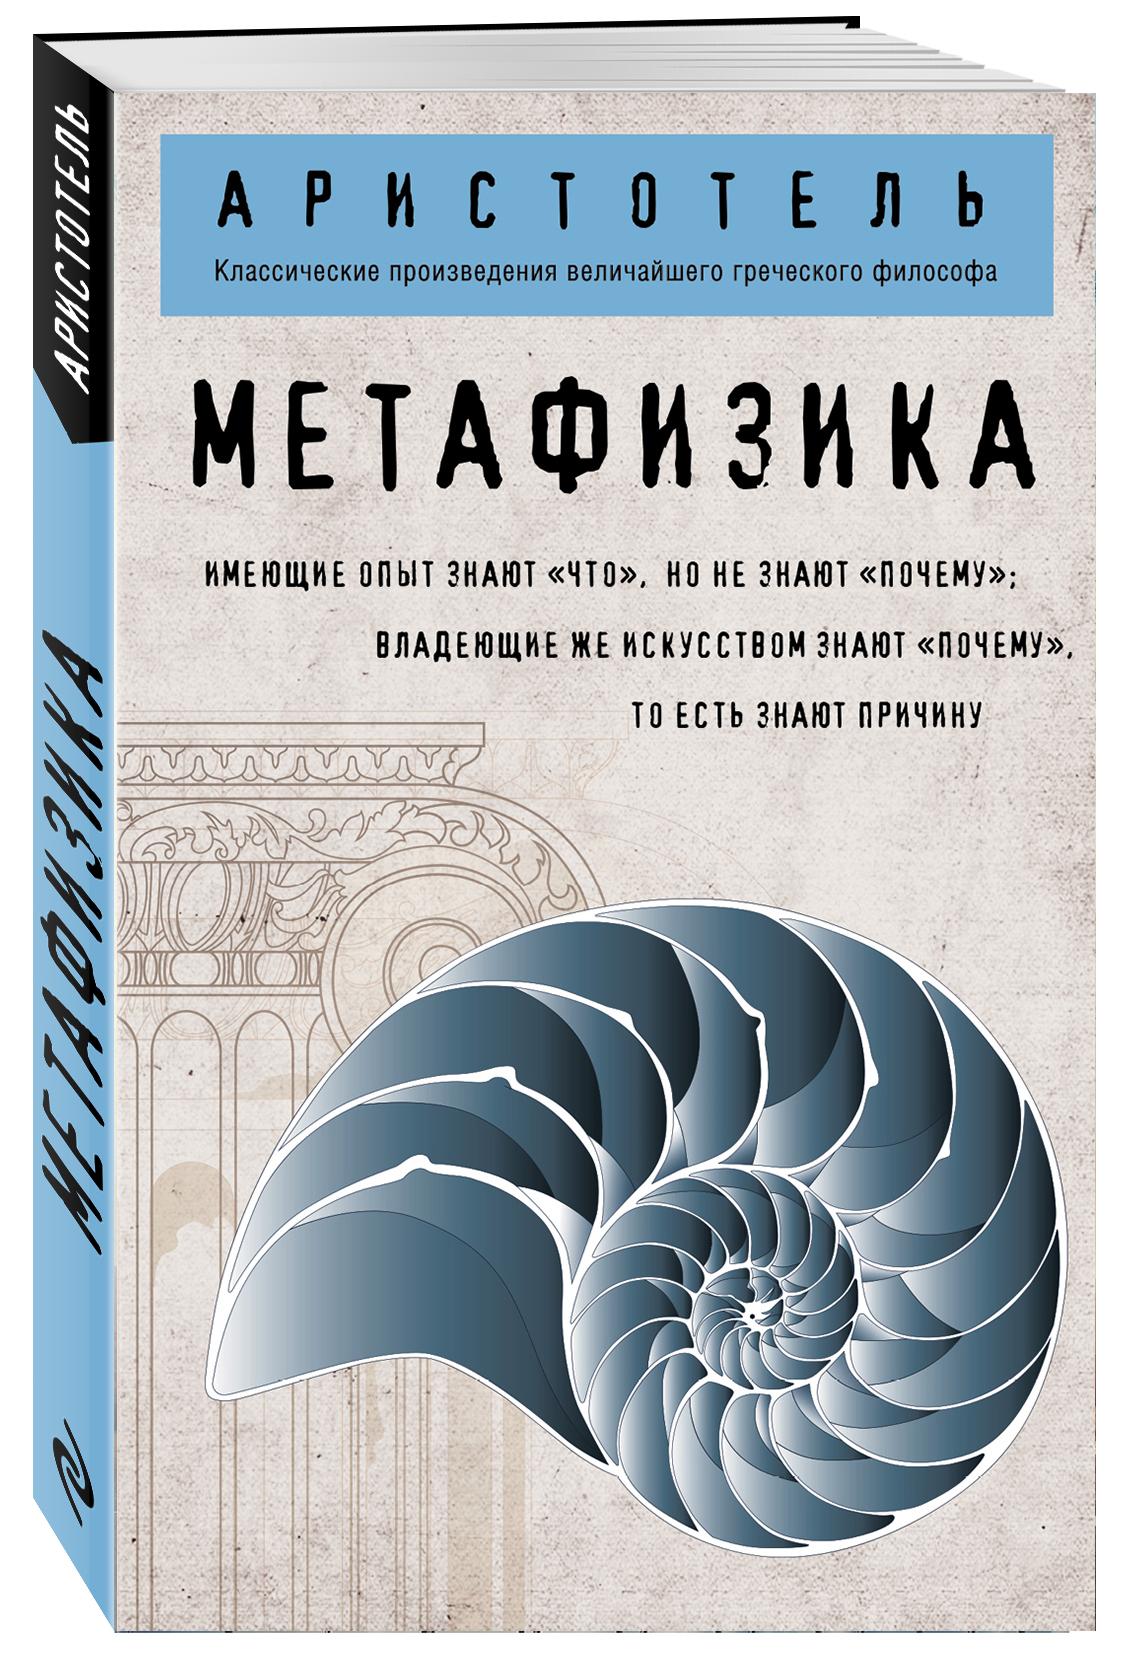 Метафизика (покет) ( Аристотель  )